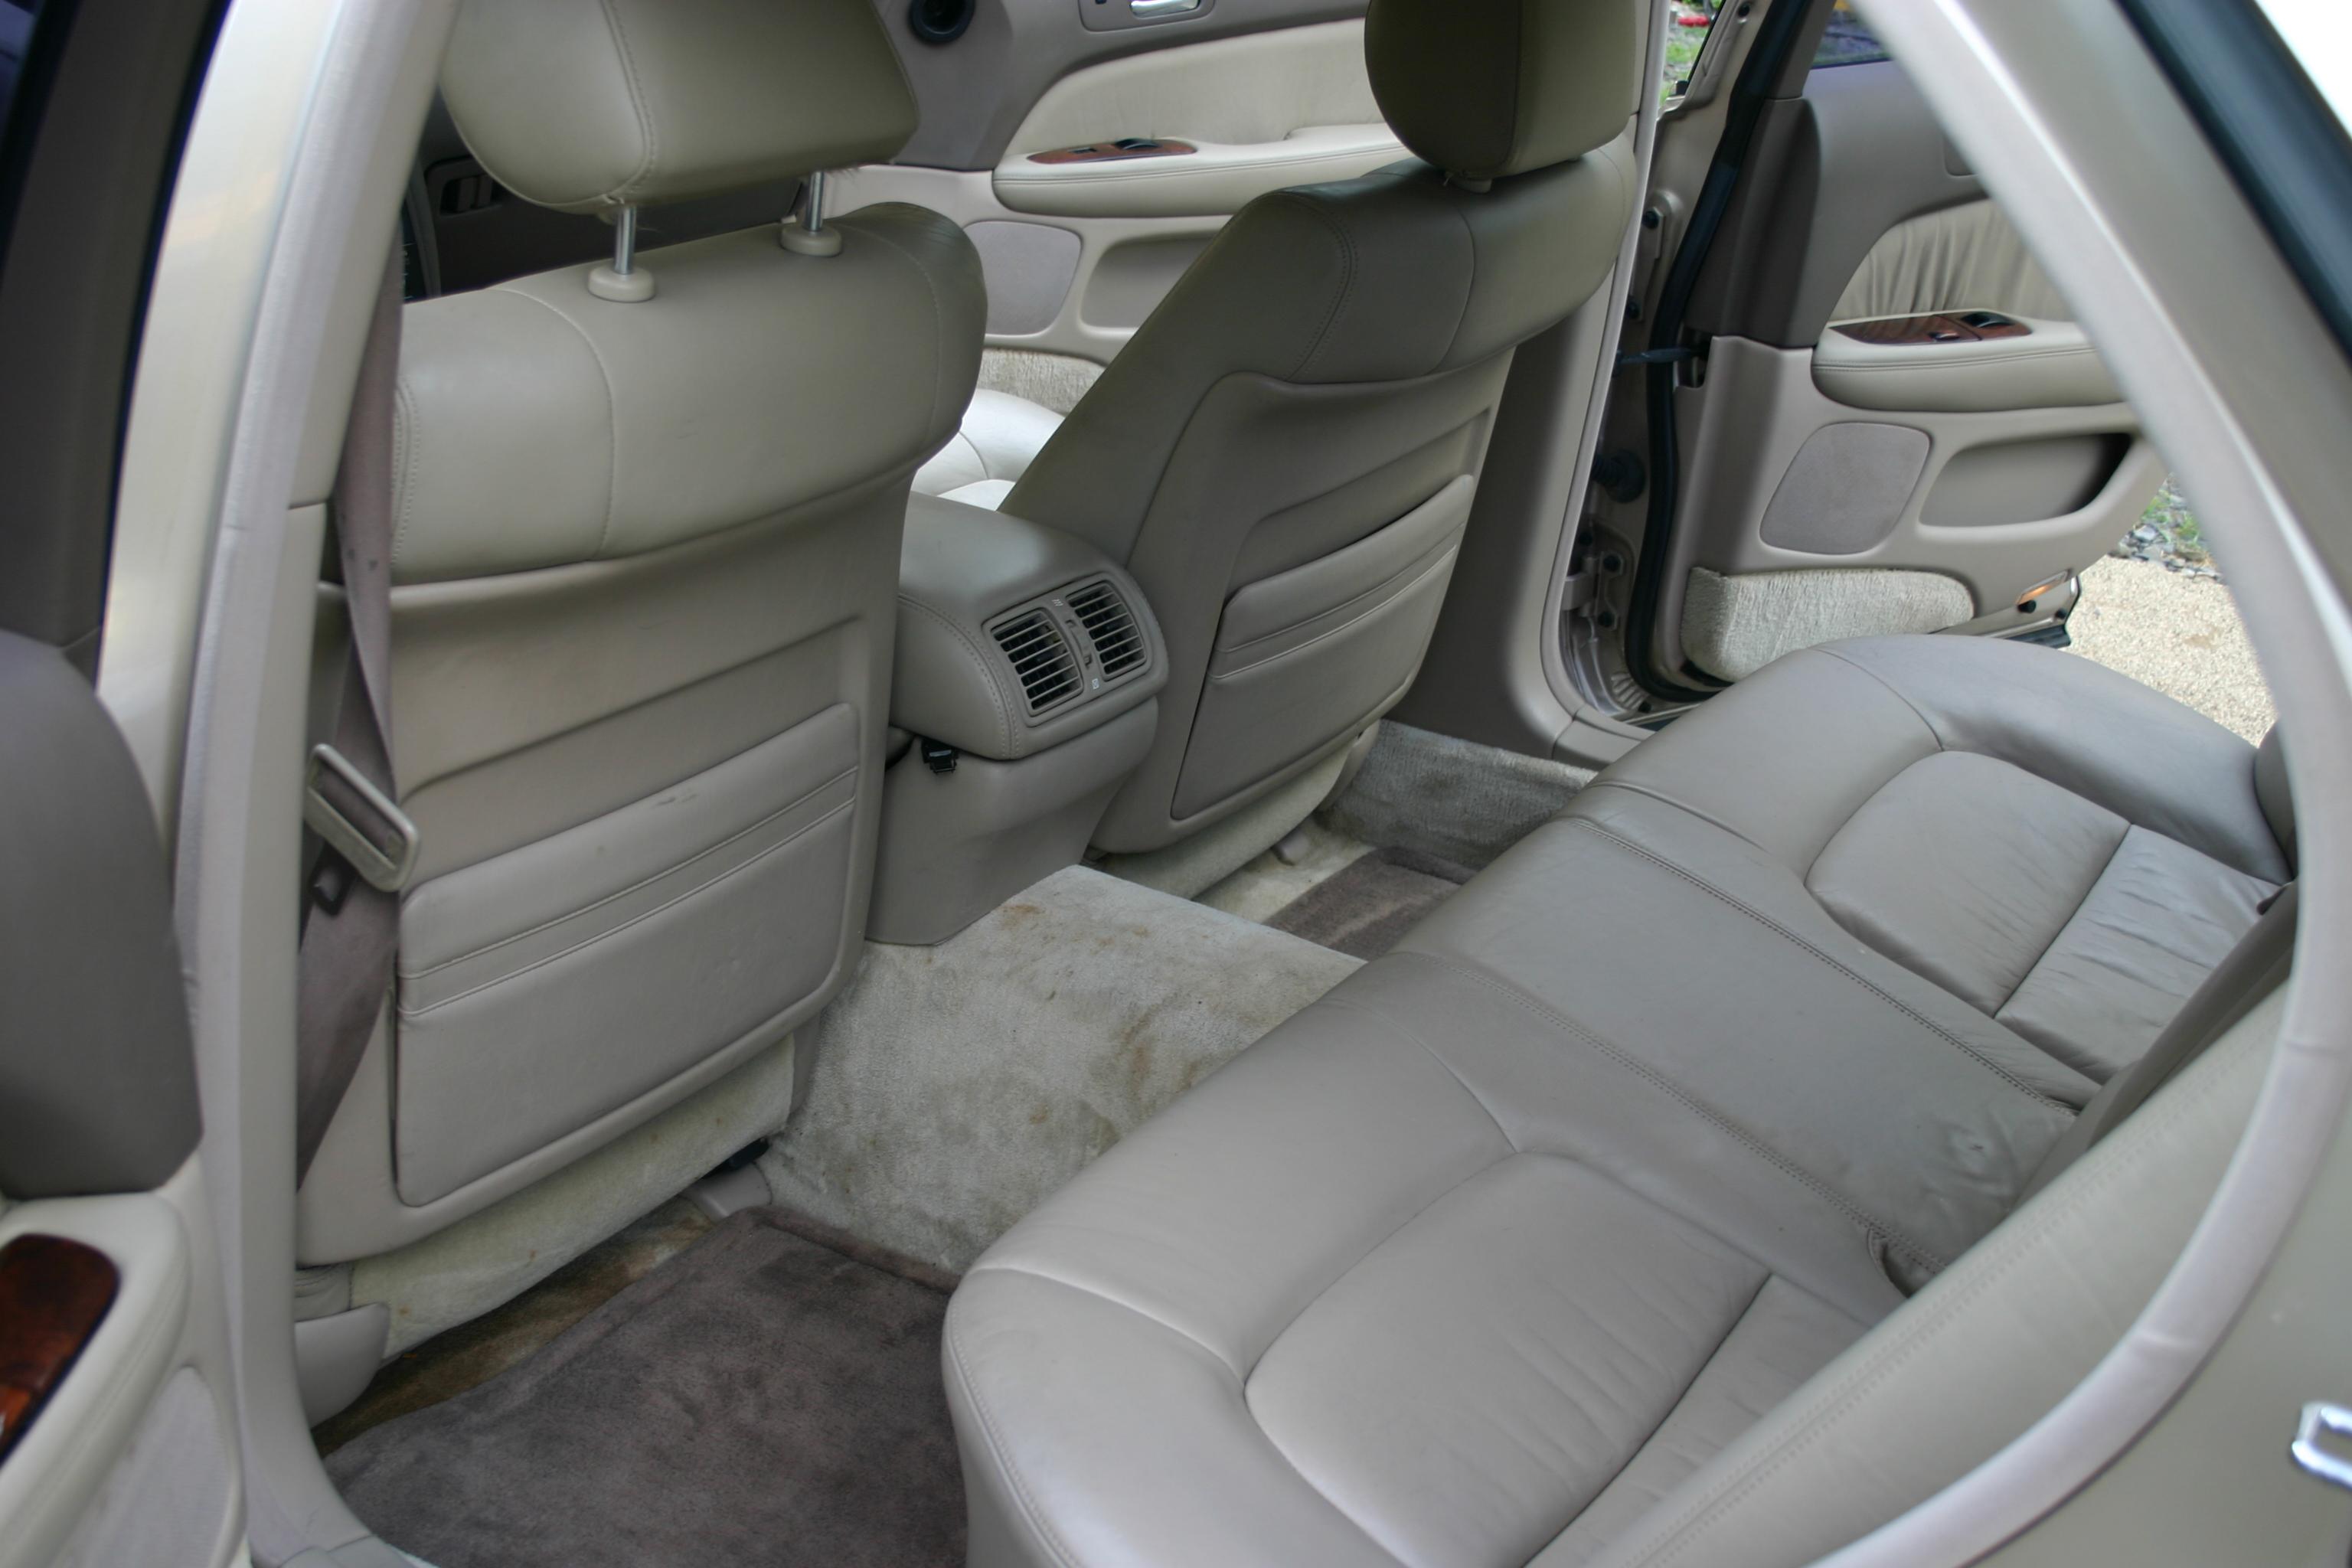 1995 Lexus LS400 Properinvestments